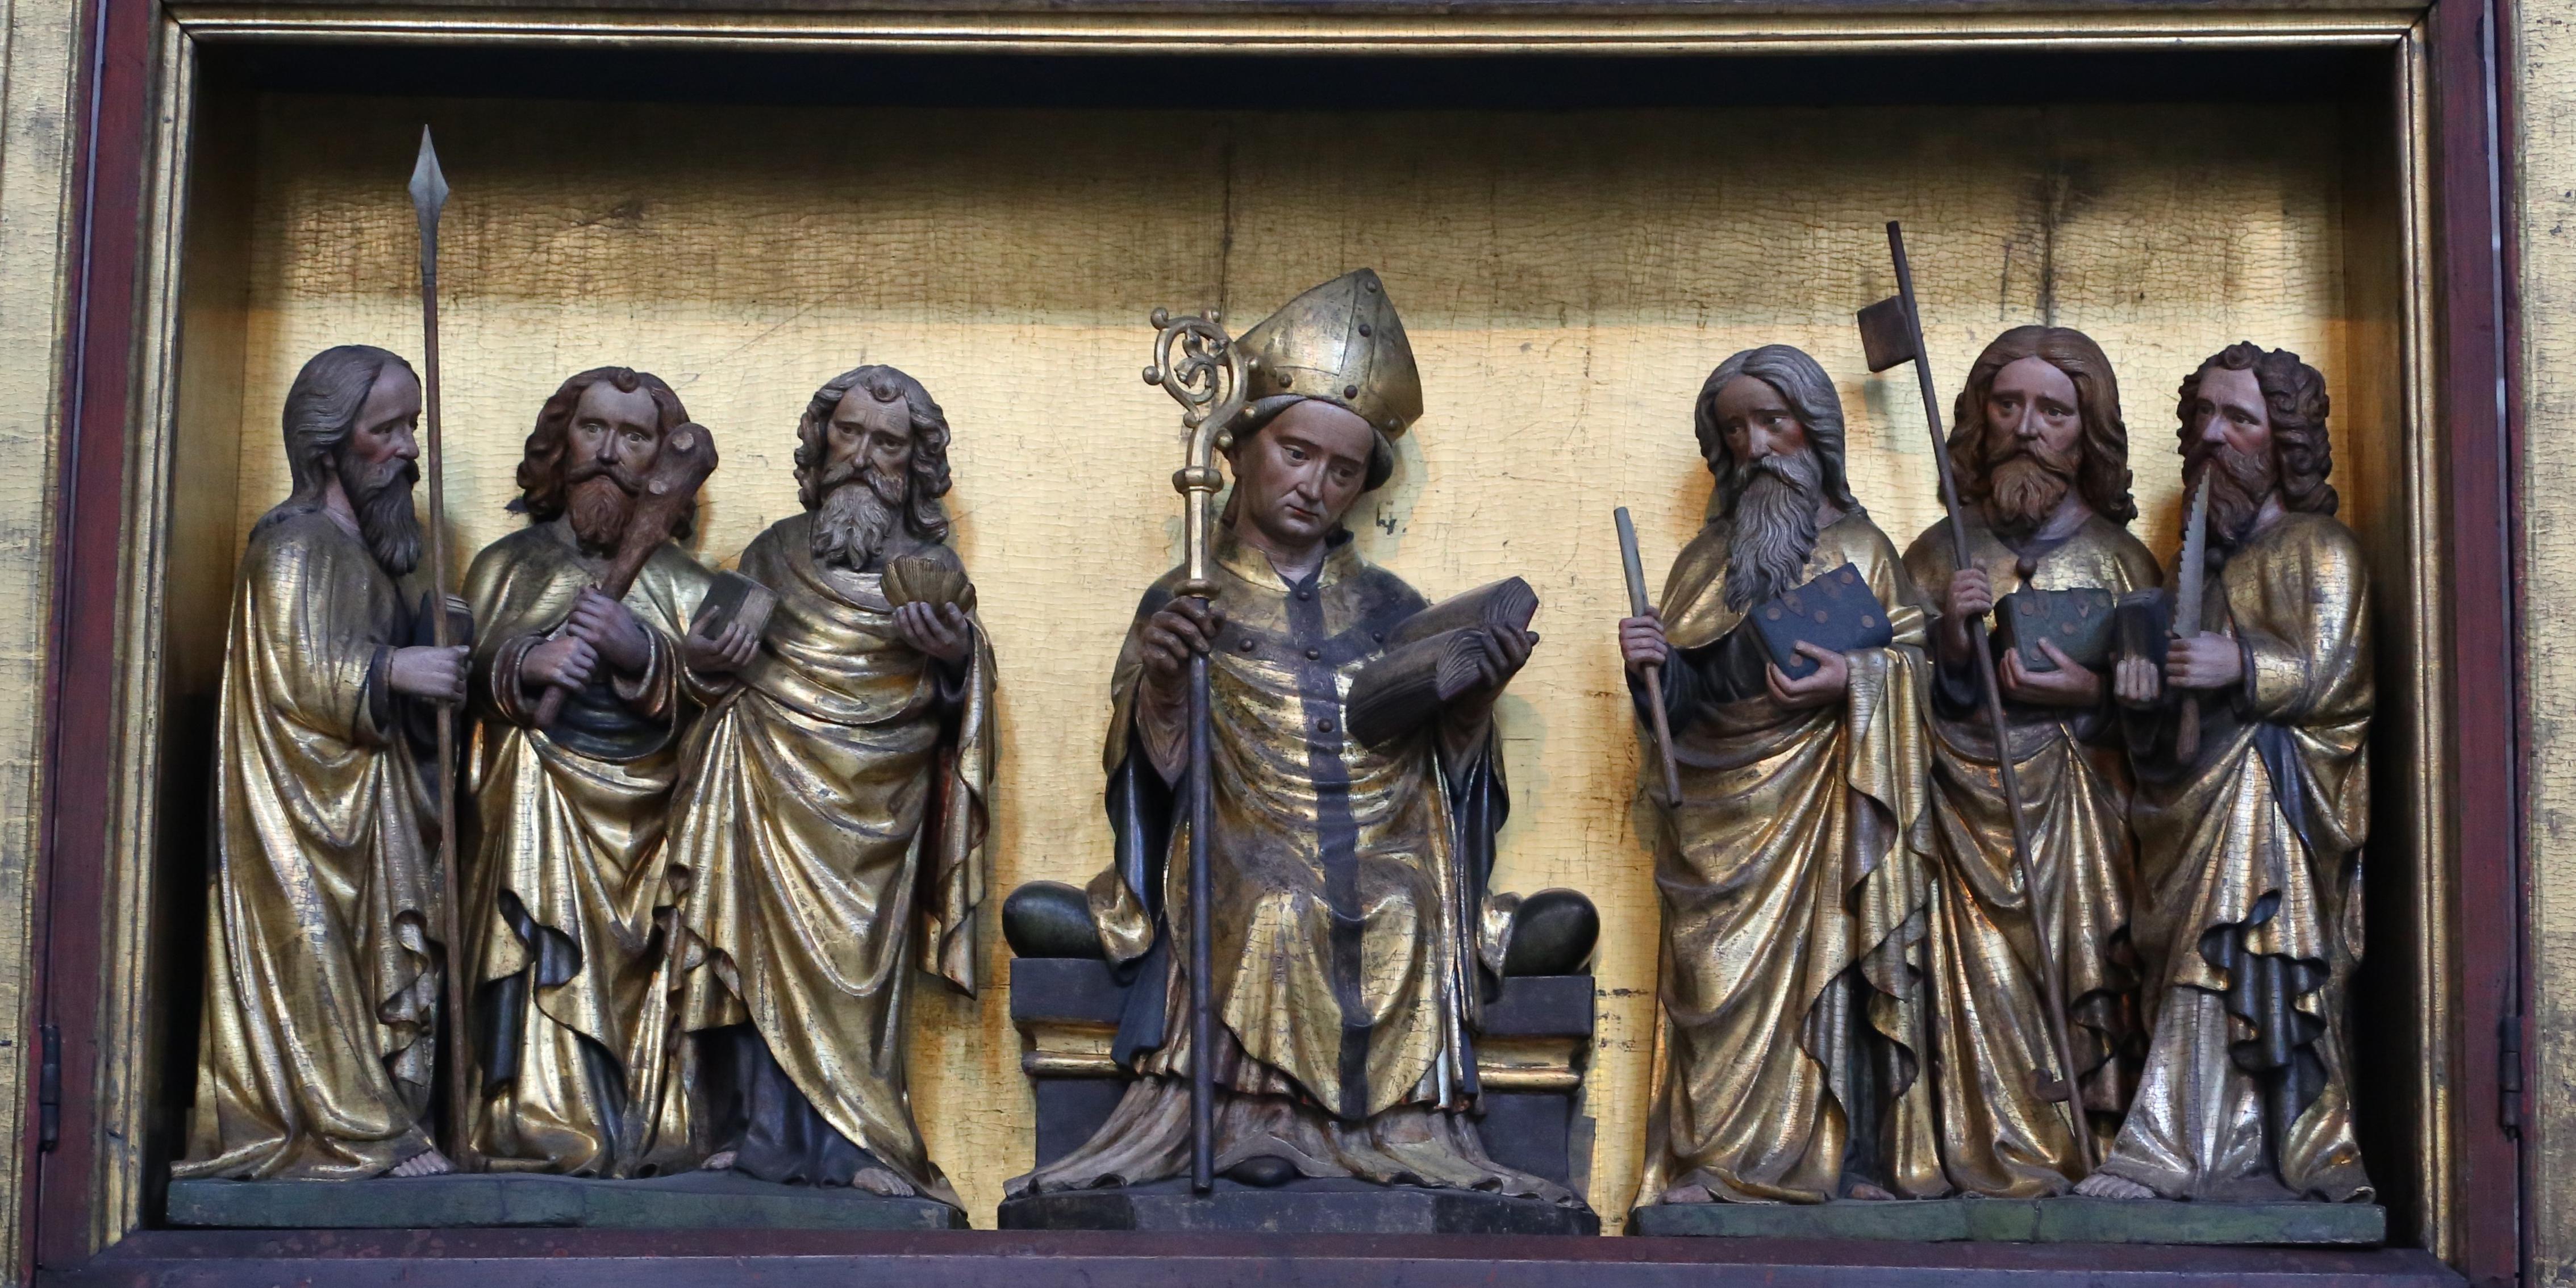 Deocarus-Altar, St. Lorenz, Nürnberg,© Rufus46